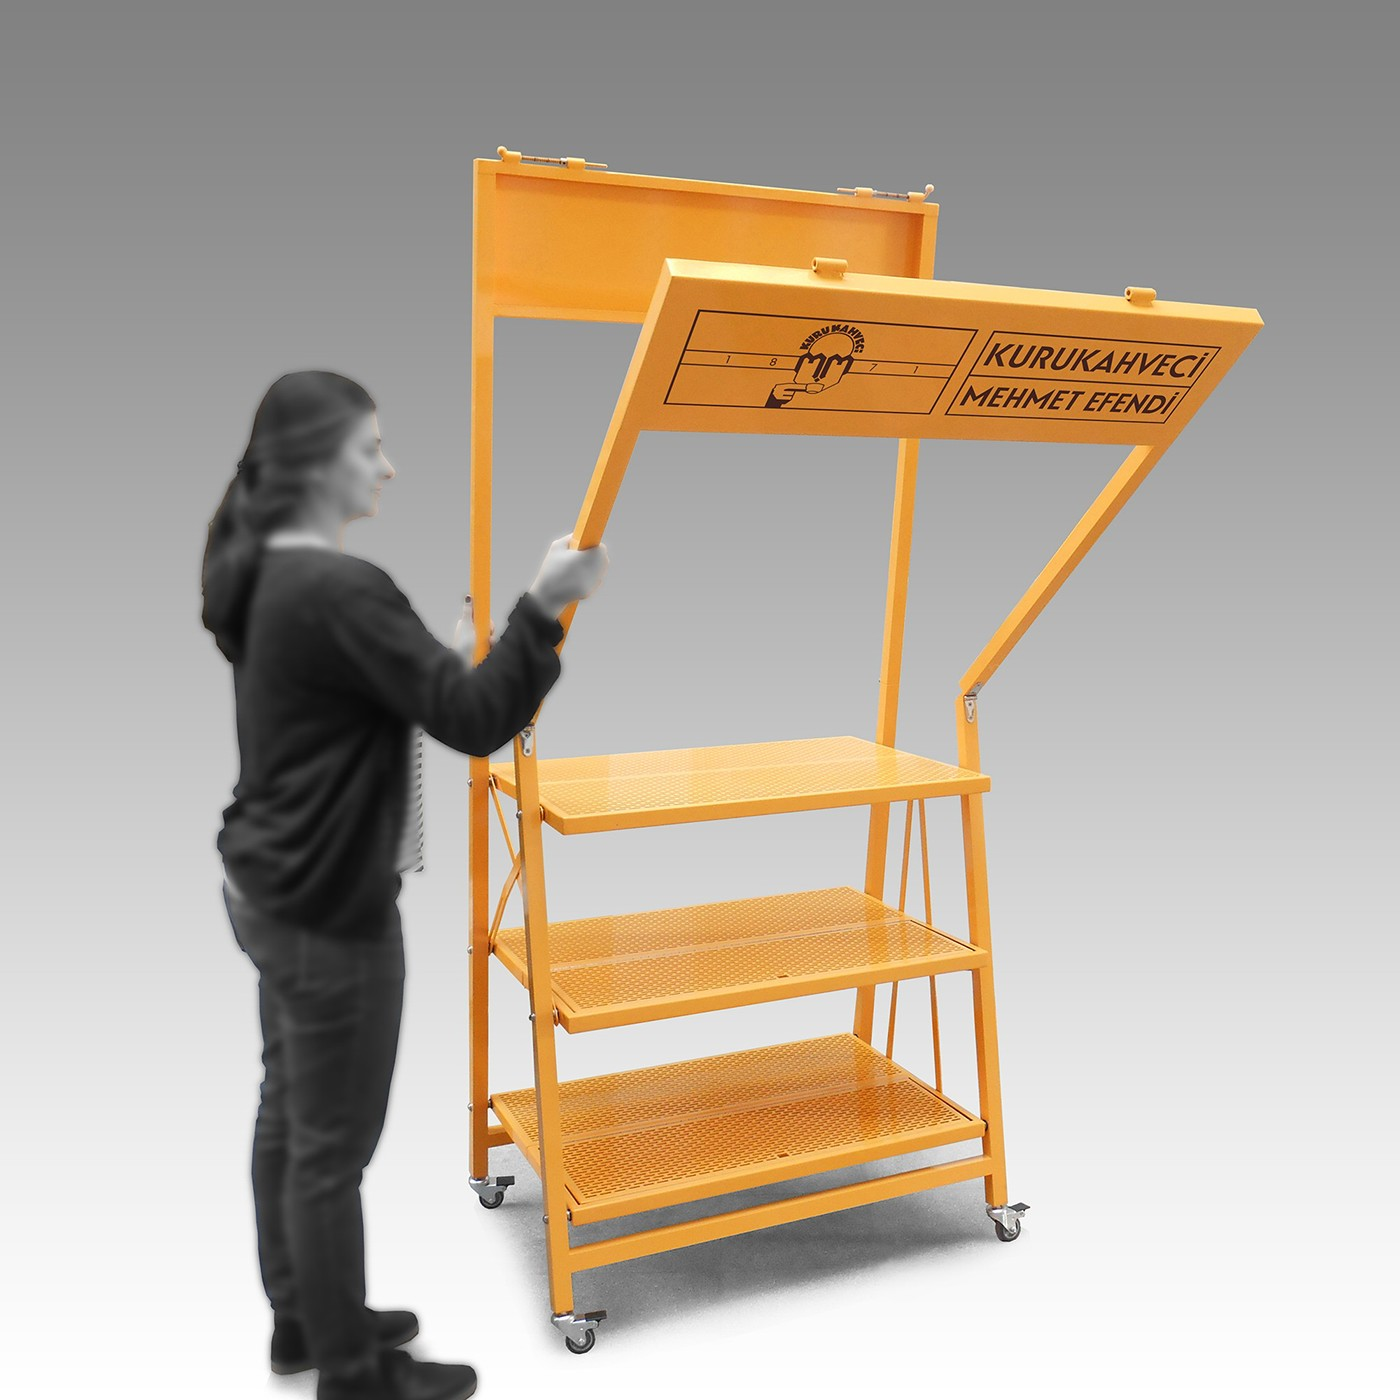 Promotion ypsilontasarim ypsilon tasarim istanbul Coffee Stand perforated Foldable flexible mobile Turkey yellow light kurukahveci mehmet efendi mokka